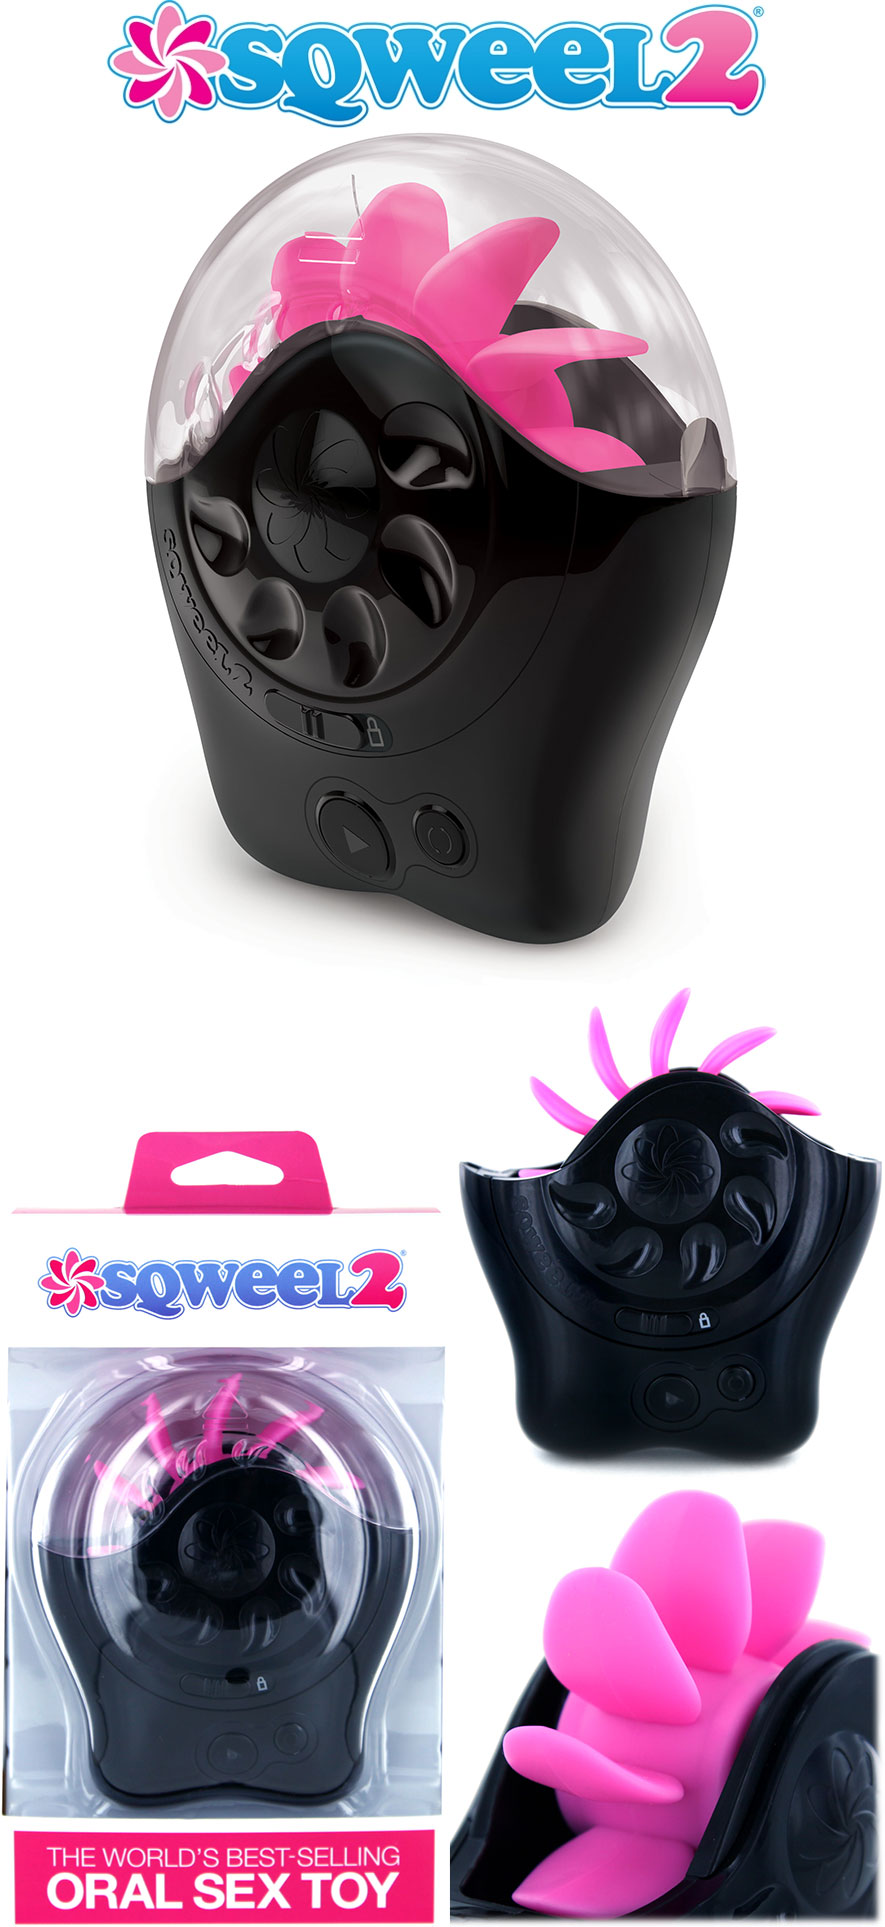 Sqweel 2 Oralsex-Simulator - Schwarz